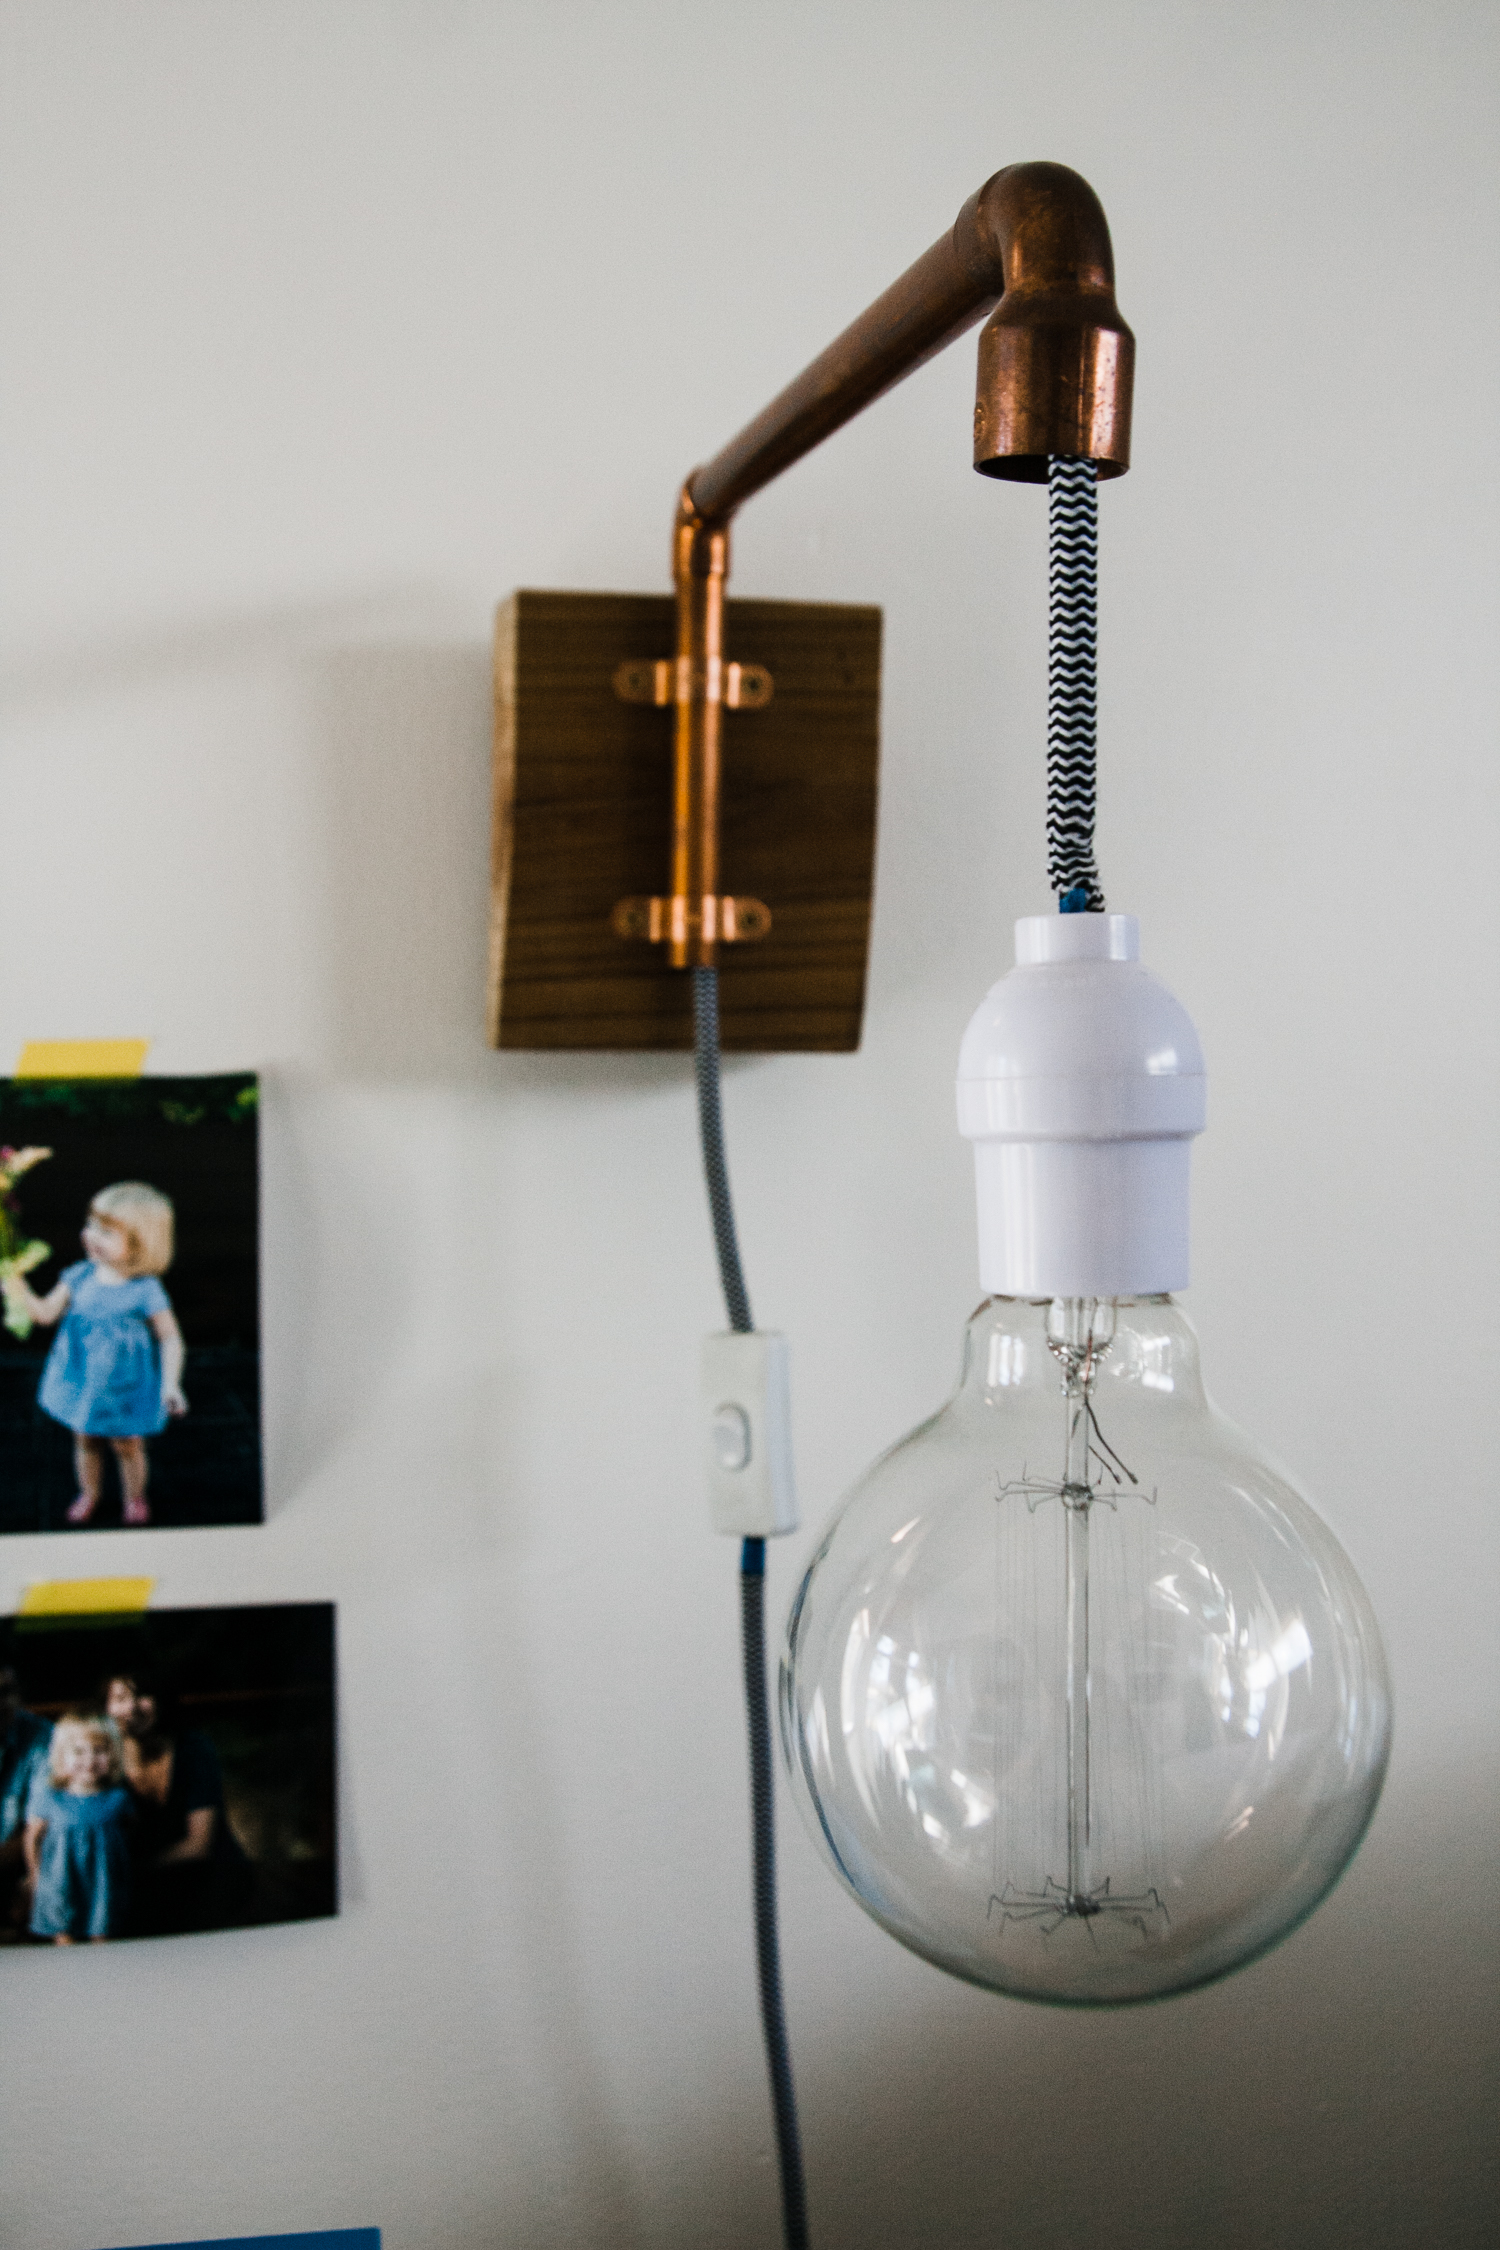 My husband made this wall-mounted lamp.